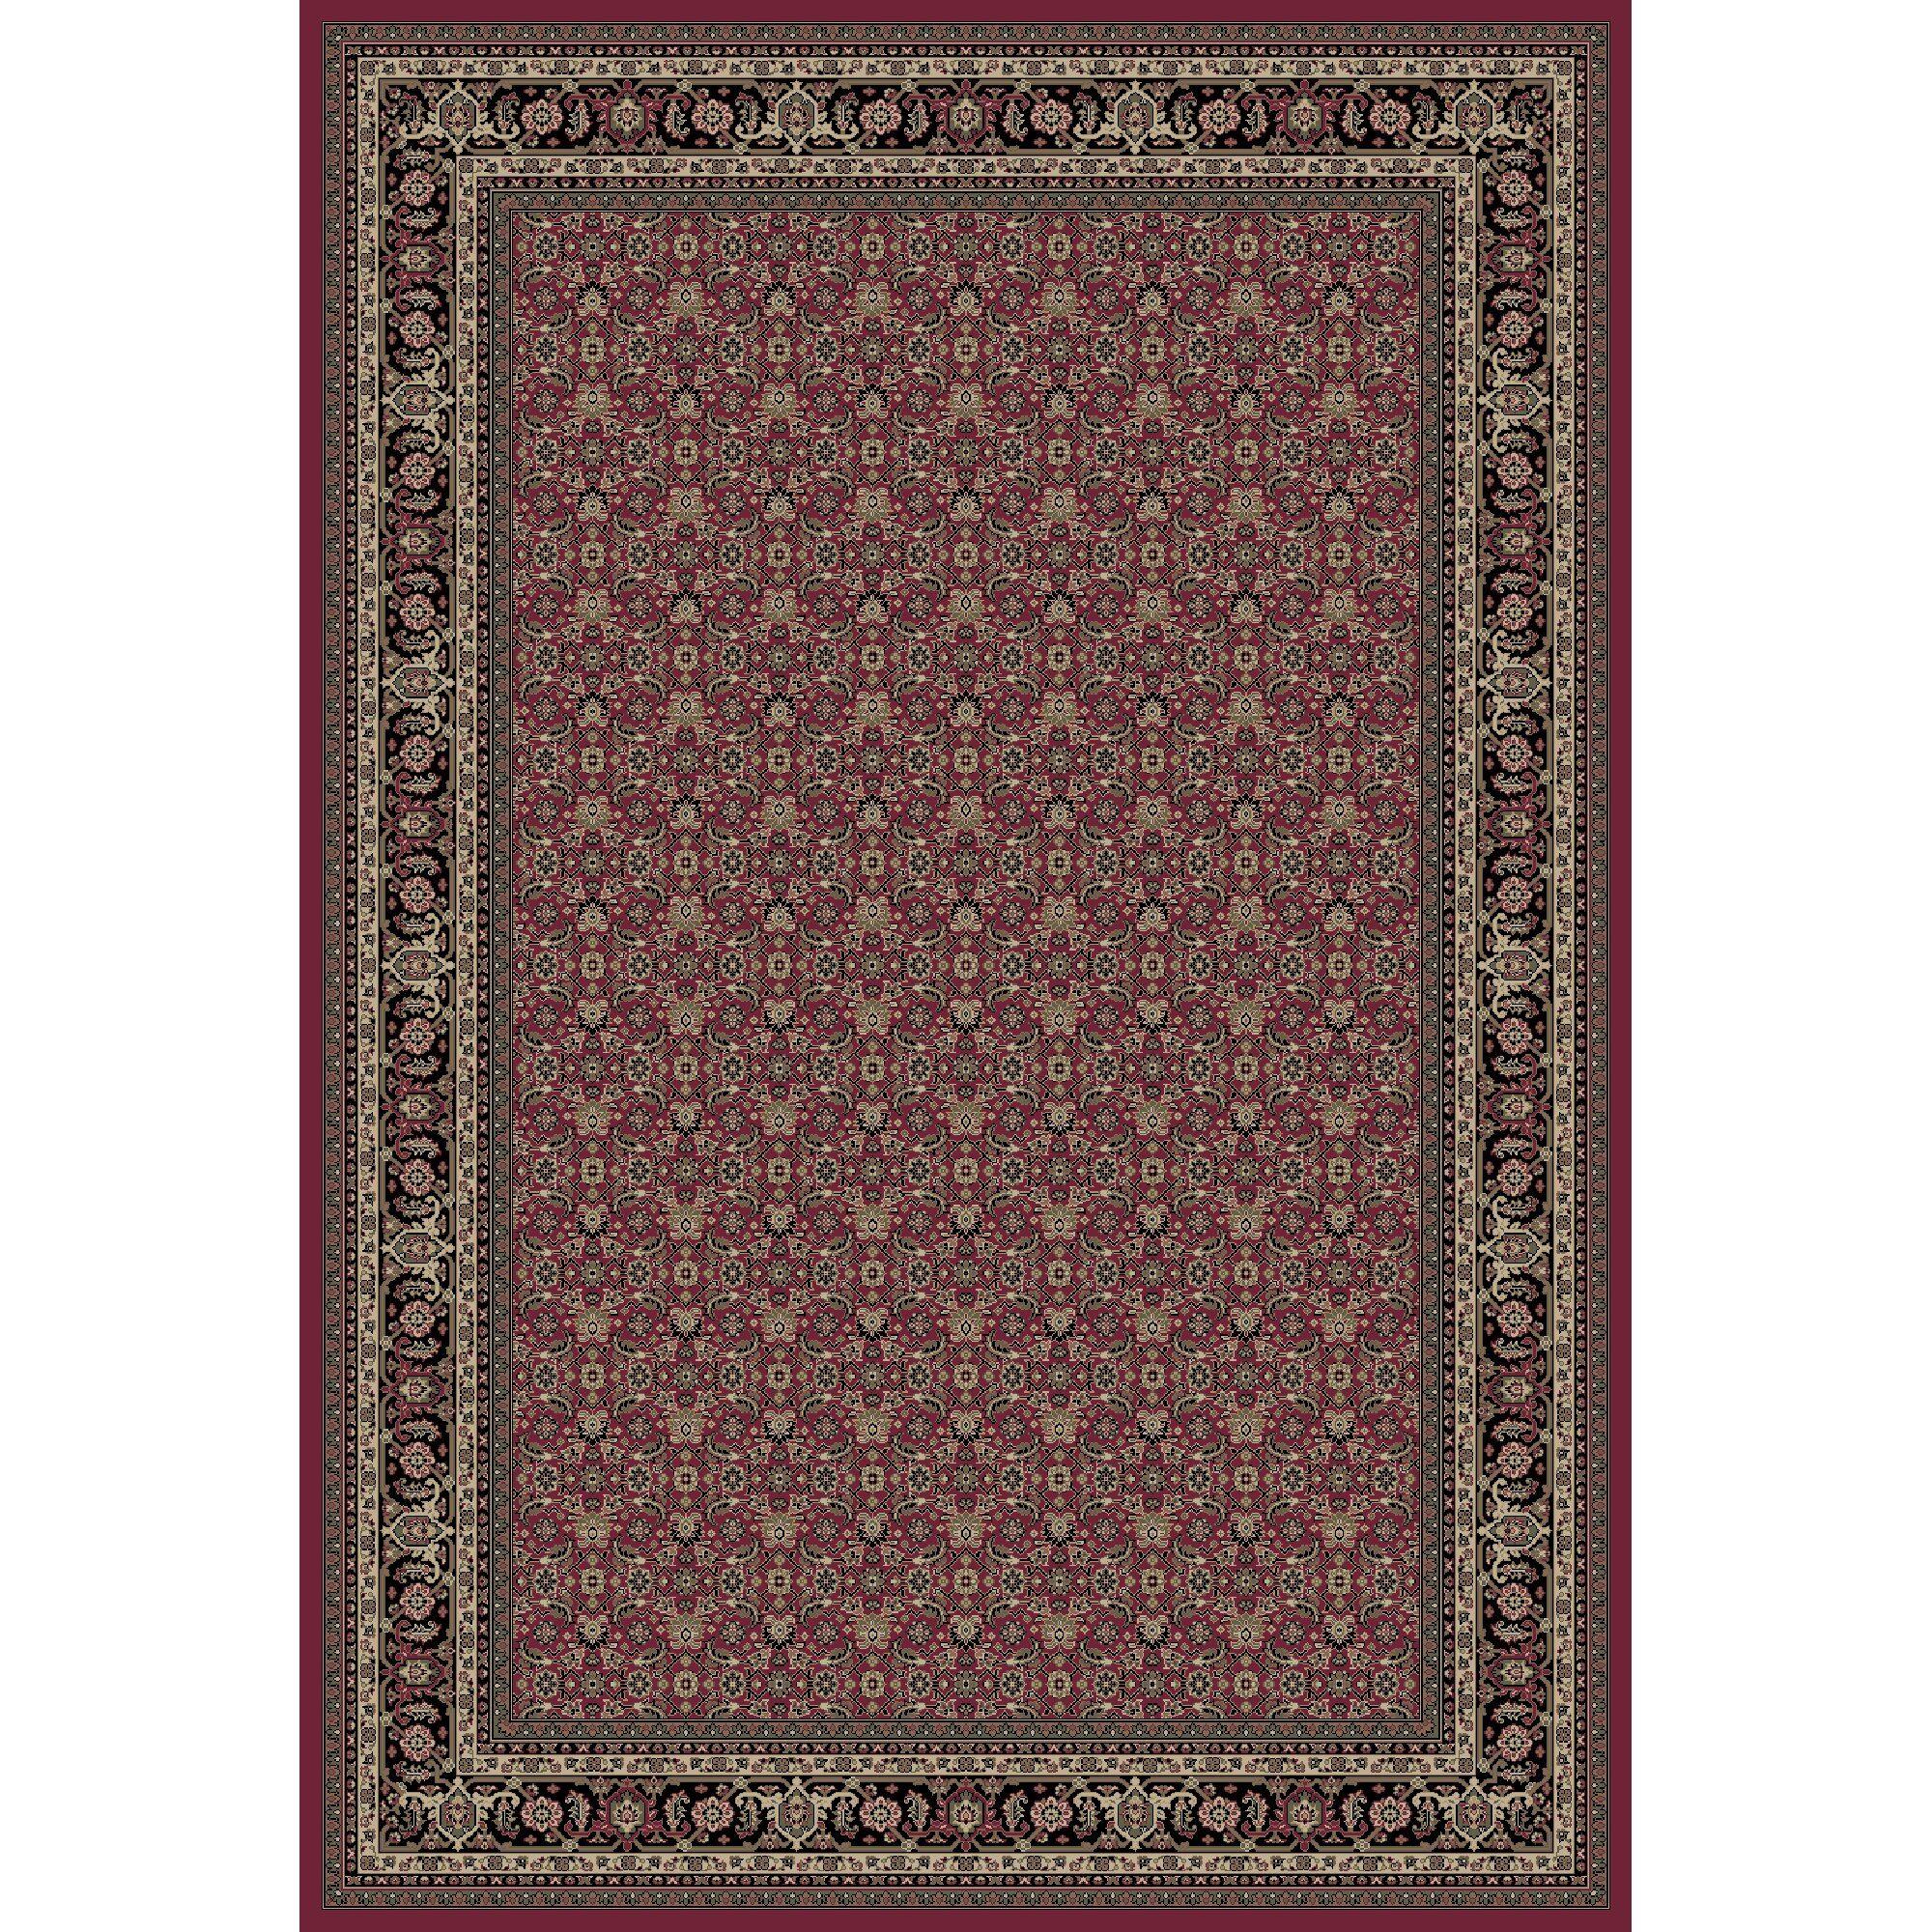 Persian Classics Herati Red Area Rug Rug Size: 7'10